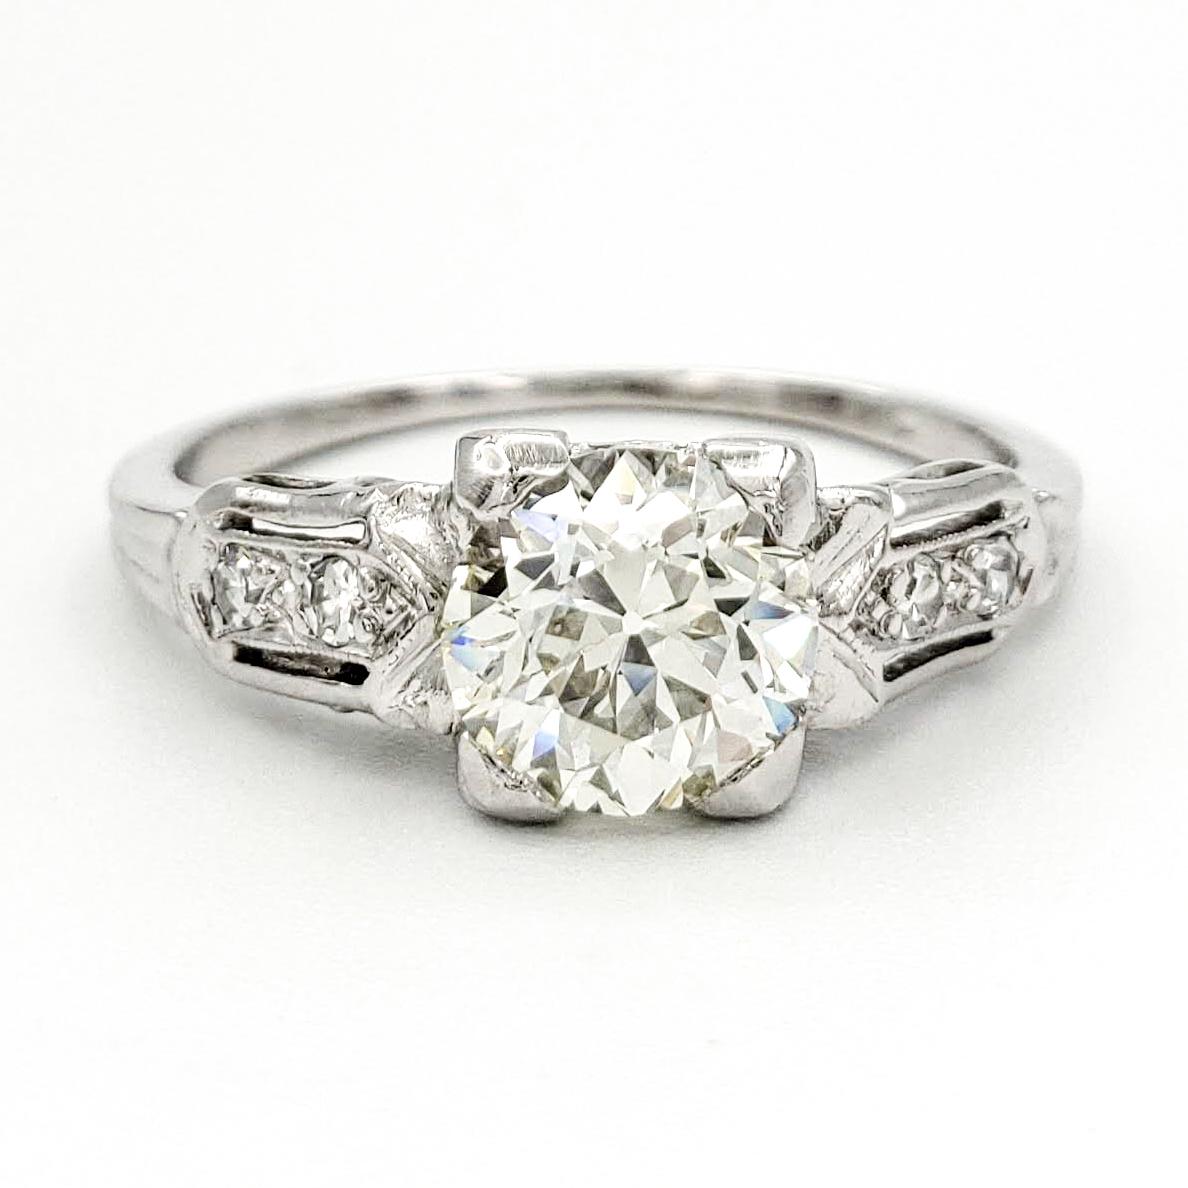 vintage-platinum-engagement-ring-with-1-12-carat-old-european-cut-diamond-egl-l-si1